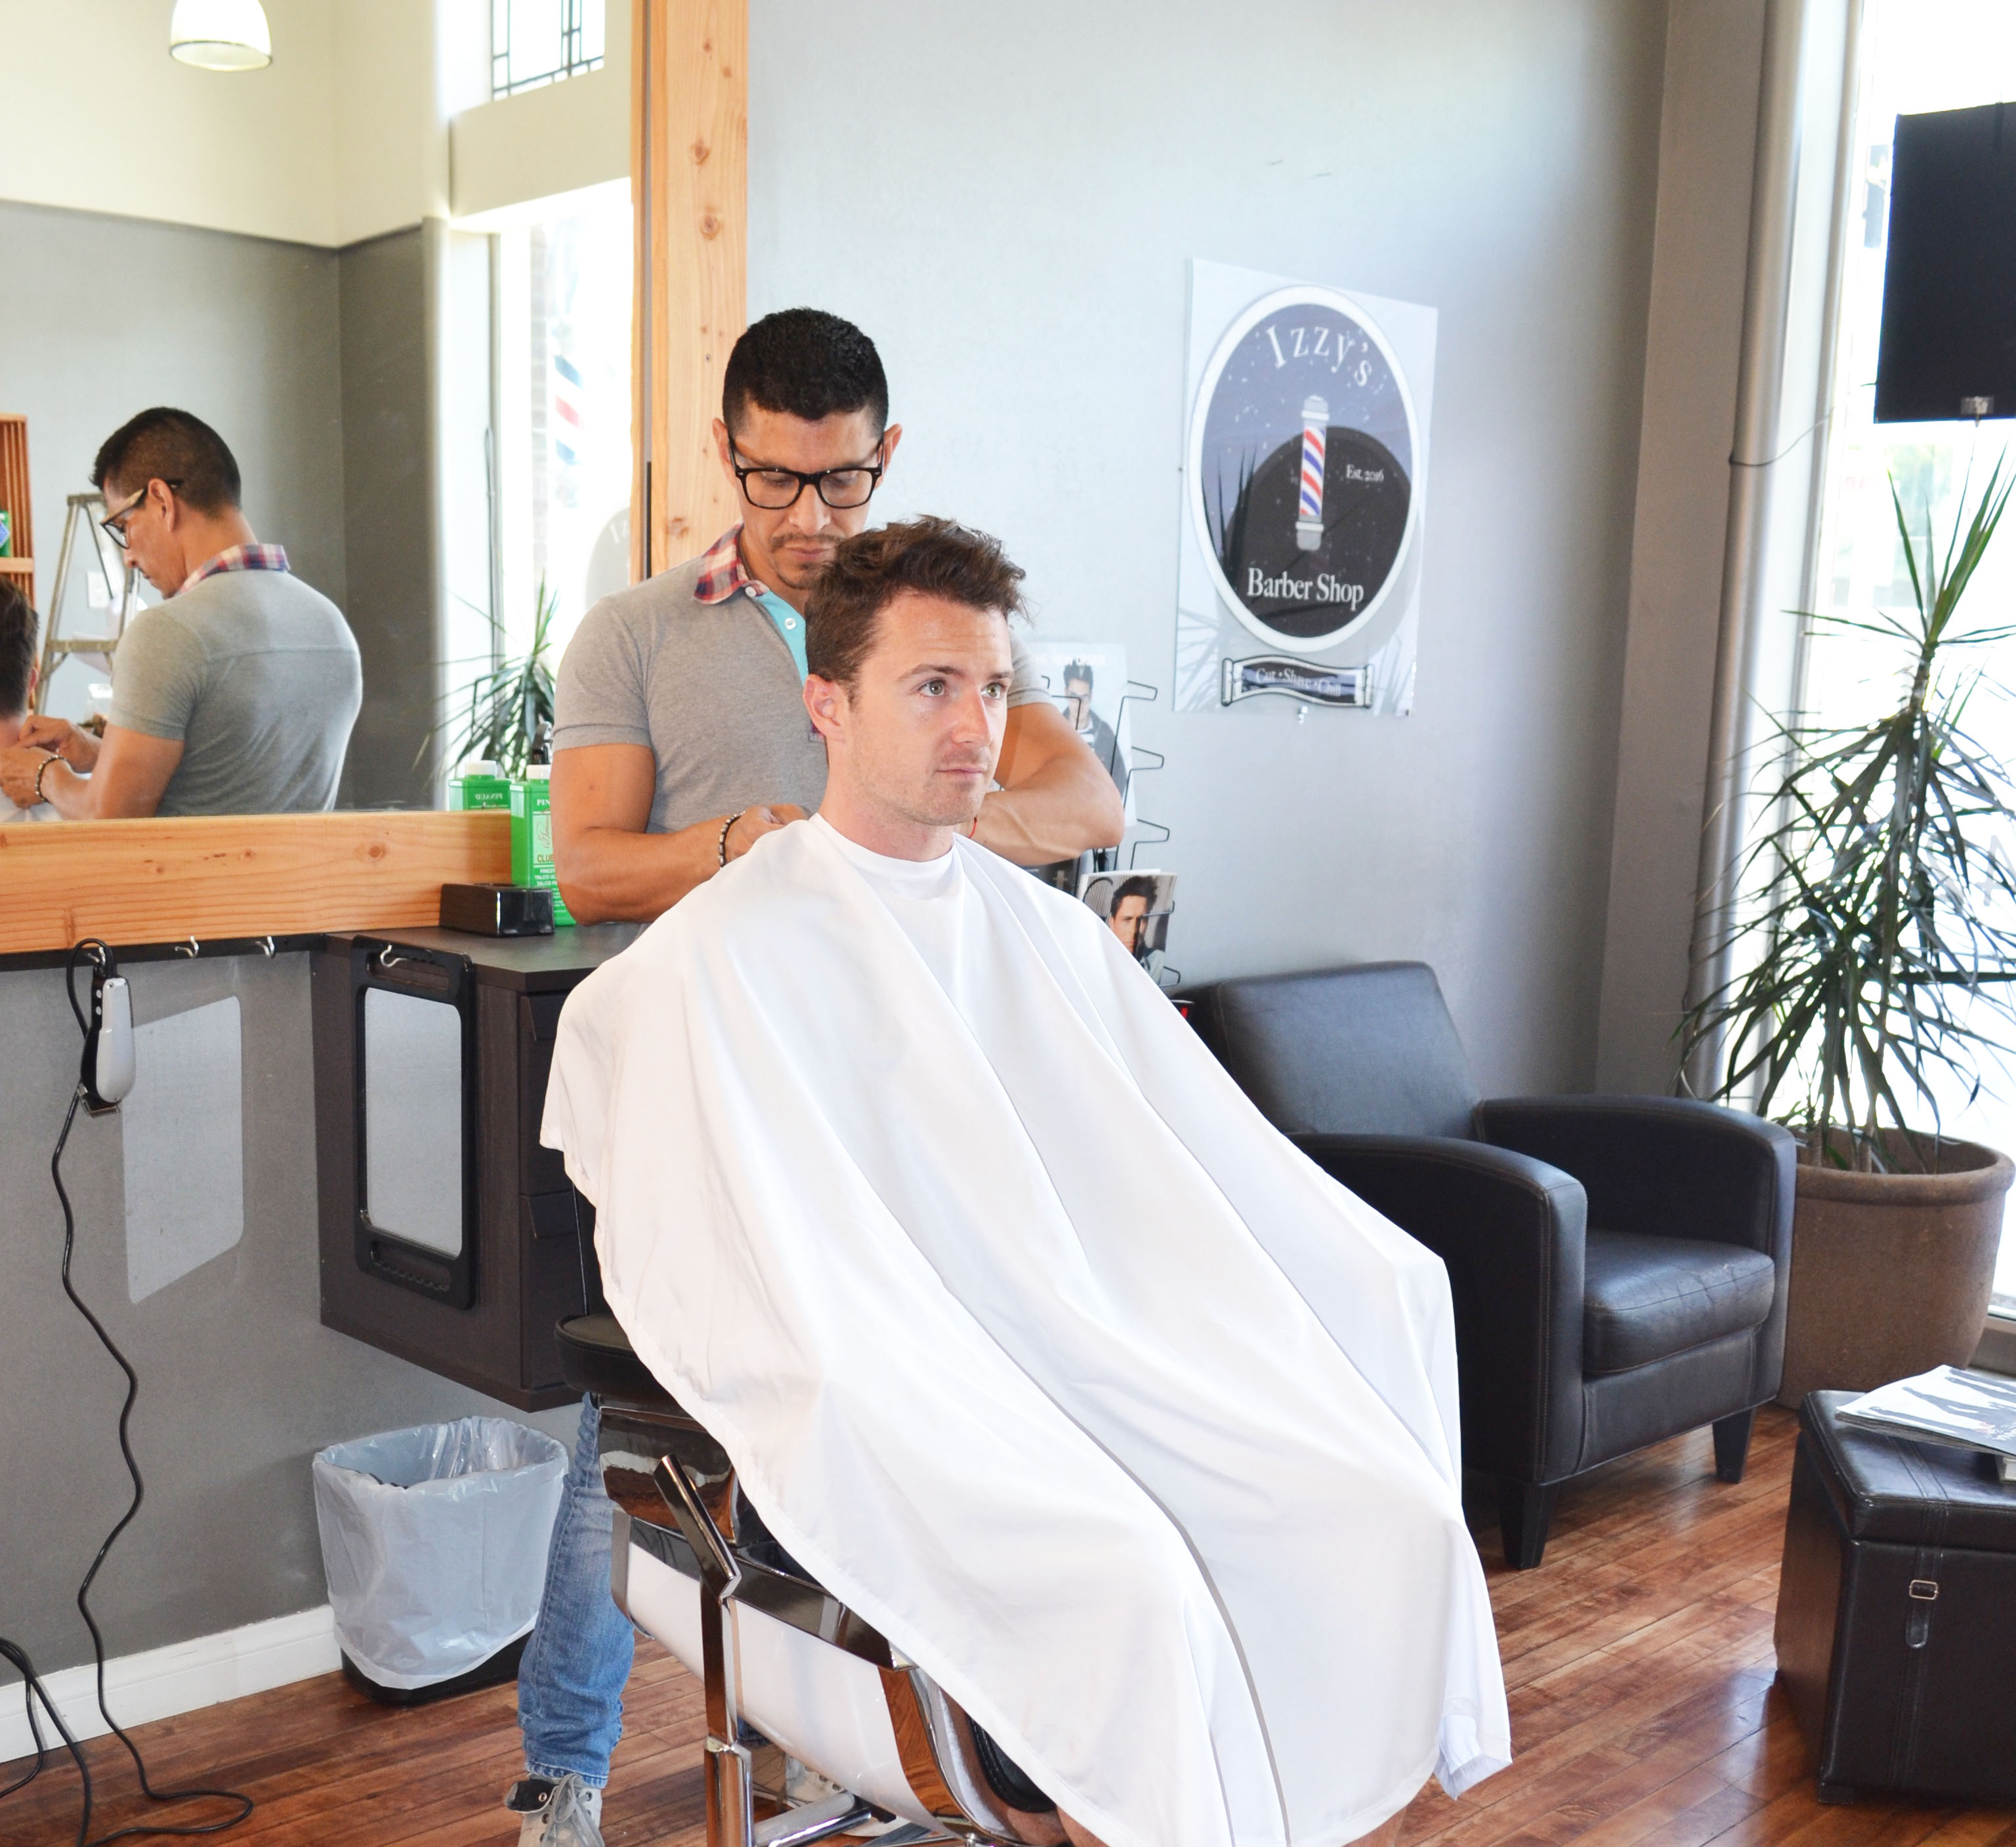 Hamptons to Hollywood - Izzy's Barbershop WeHo